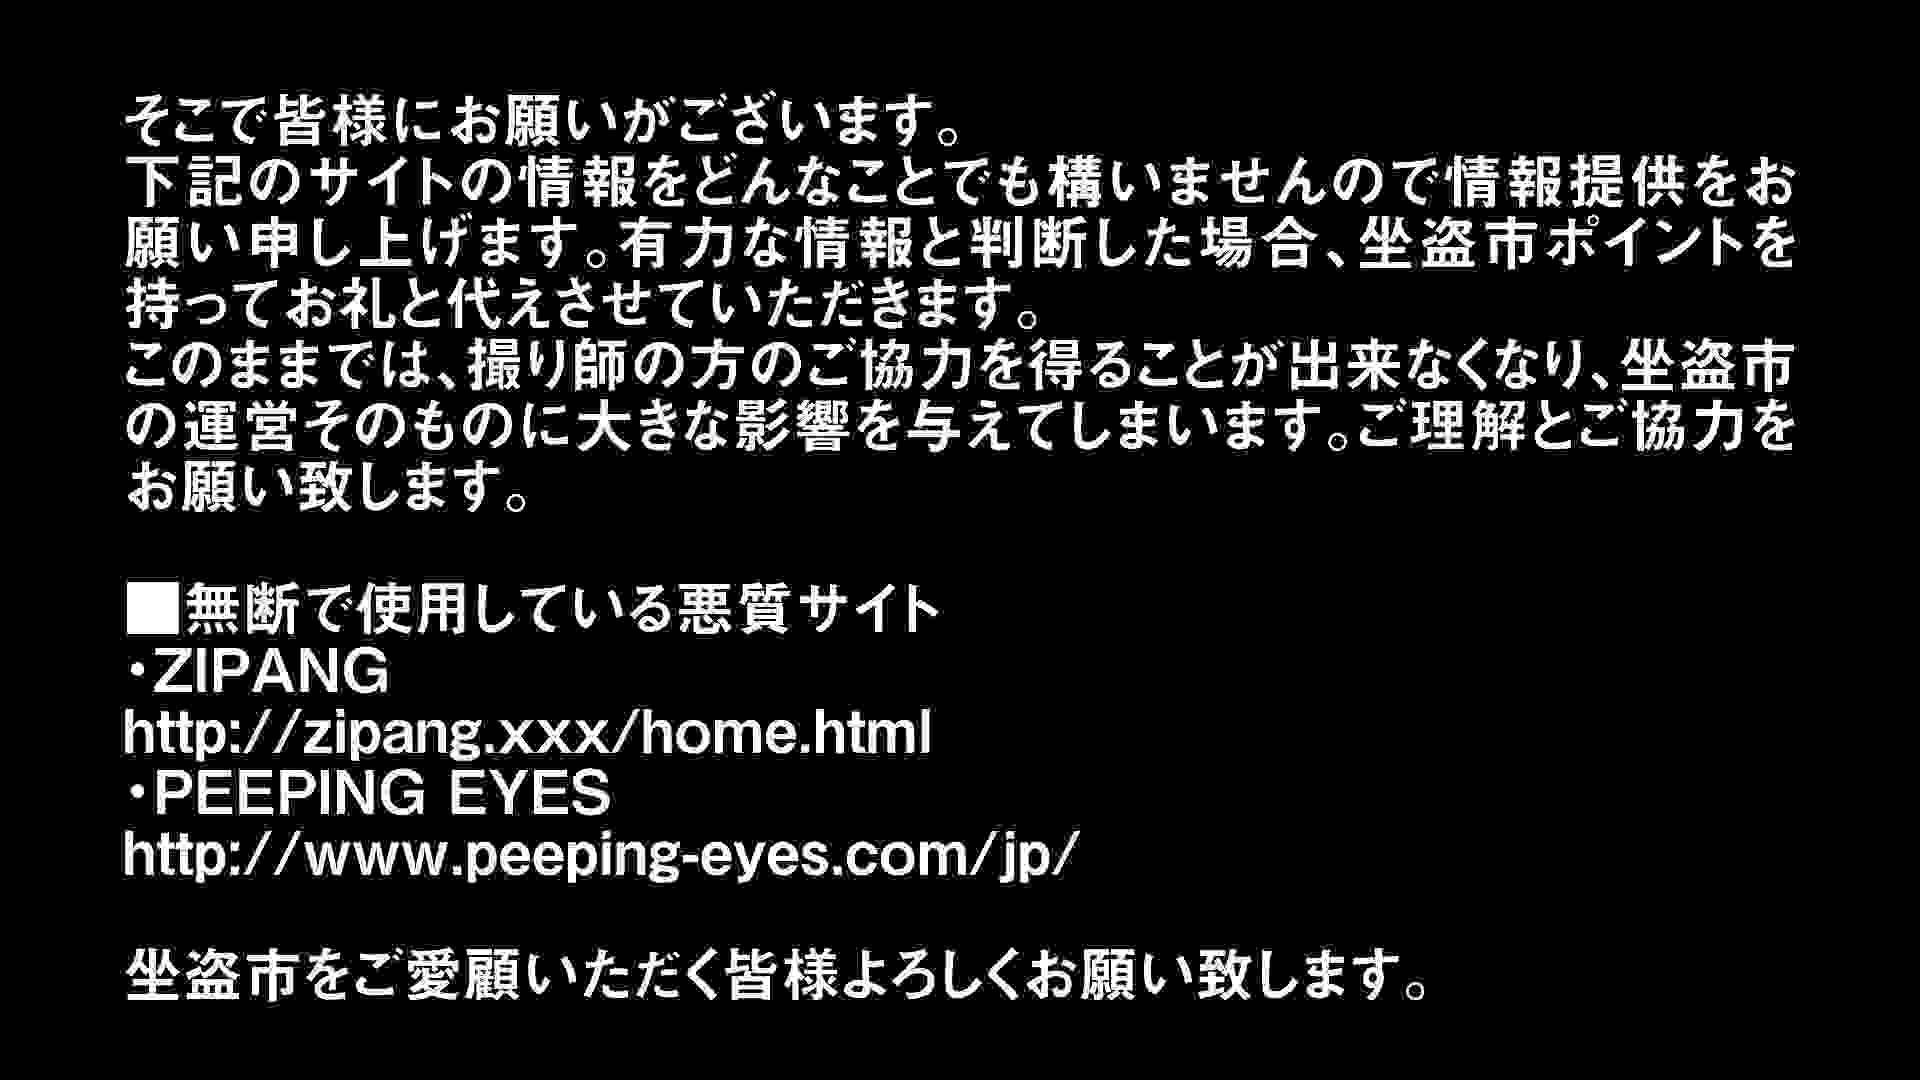 Aquaな露天風呂Vol.300 盗撮  83連発 33